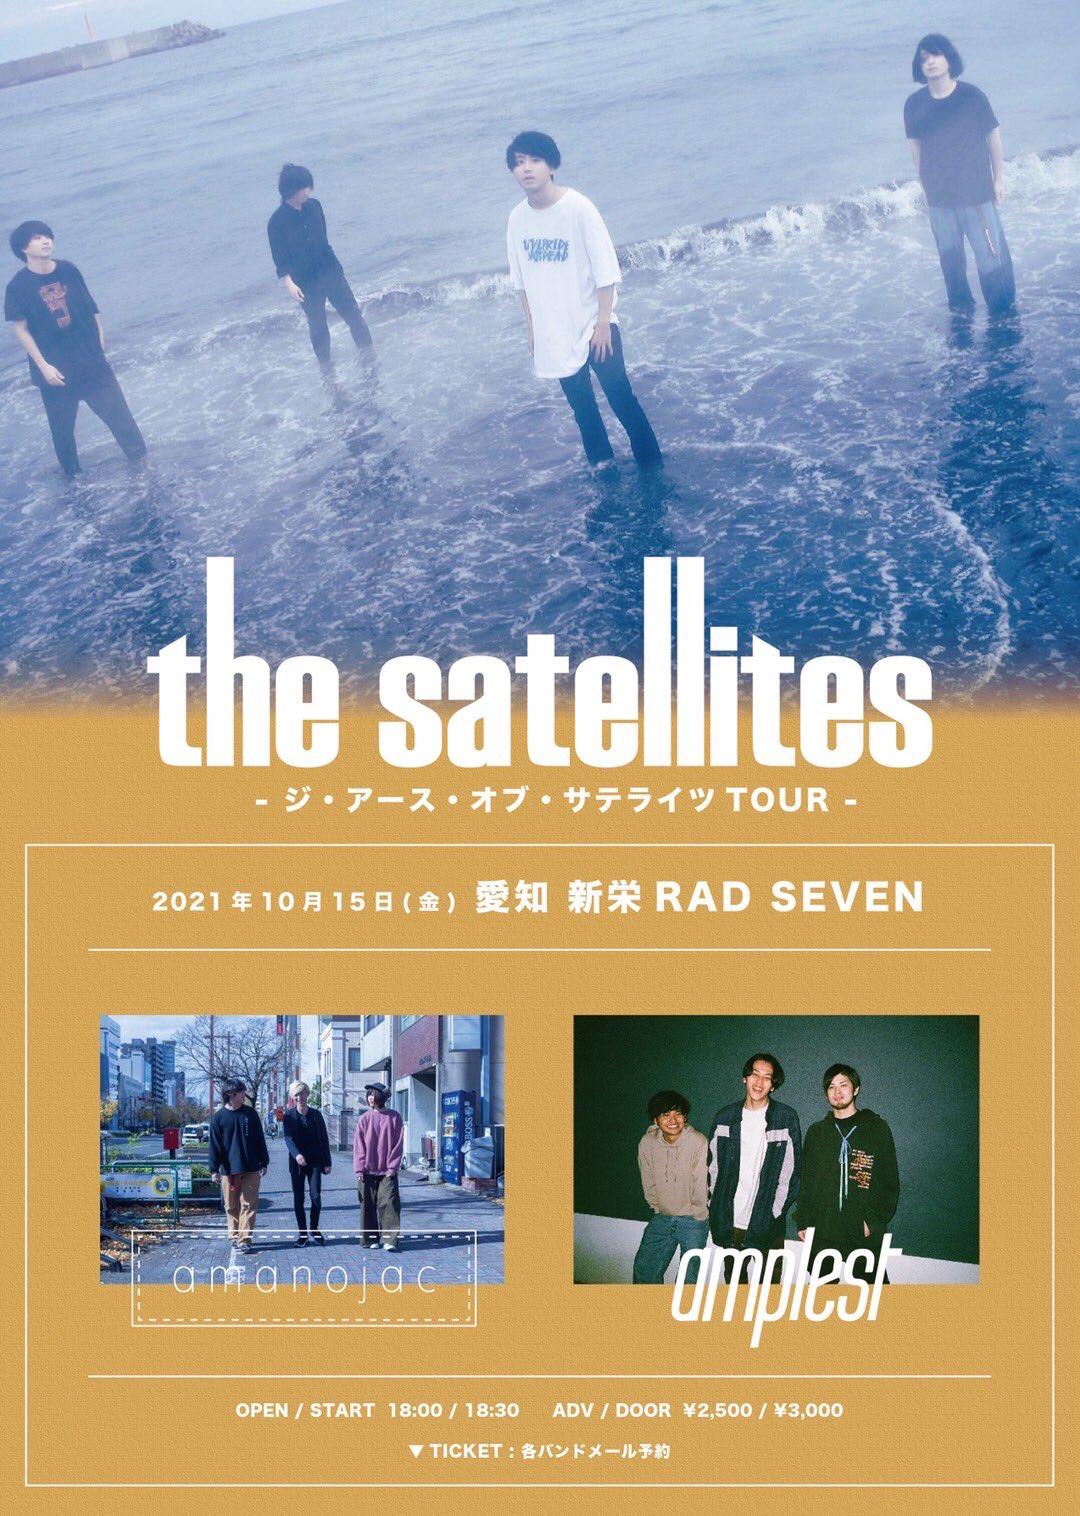 the satellites - ジ・アース・オブ・サテライツ TOUR -